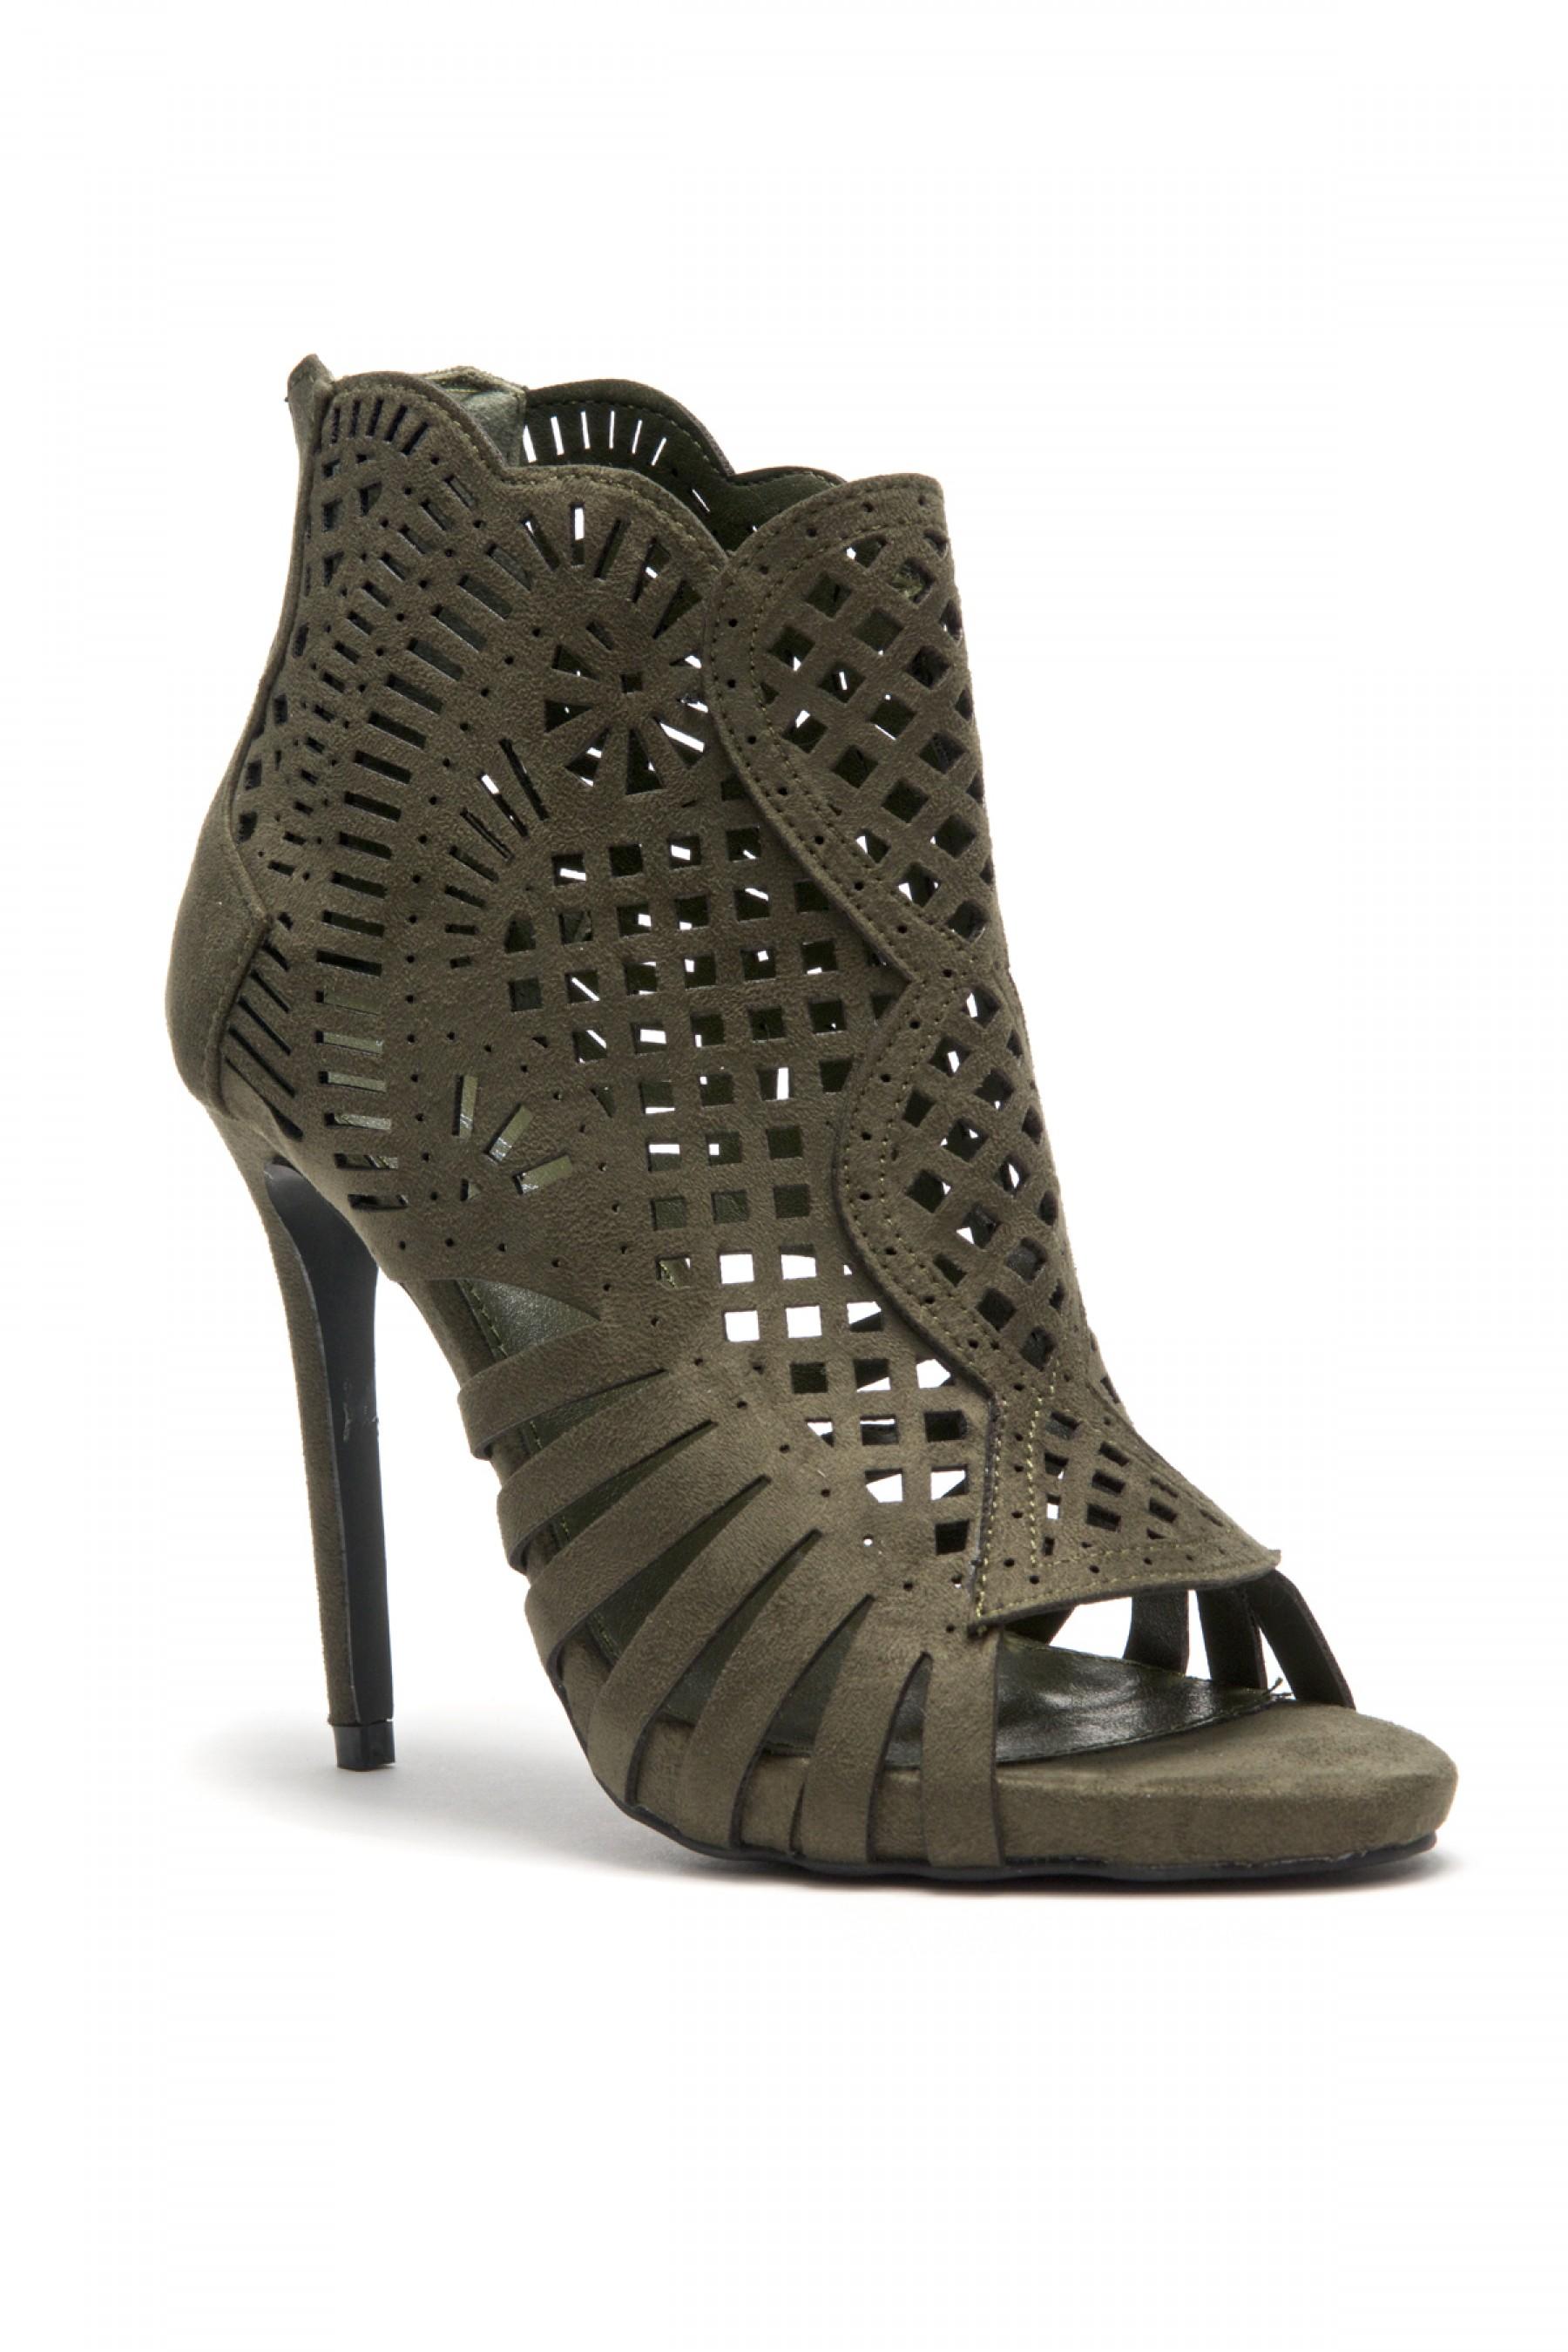 HerStyle Women's Manmade Belidda  a peep toe, stiletto heel, lacer cutter design - Olive